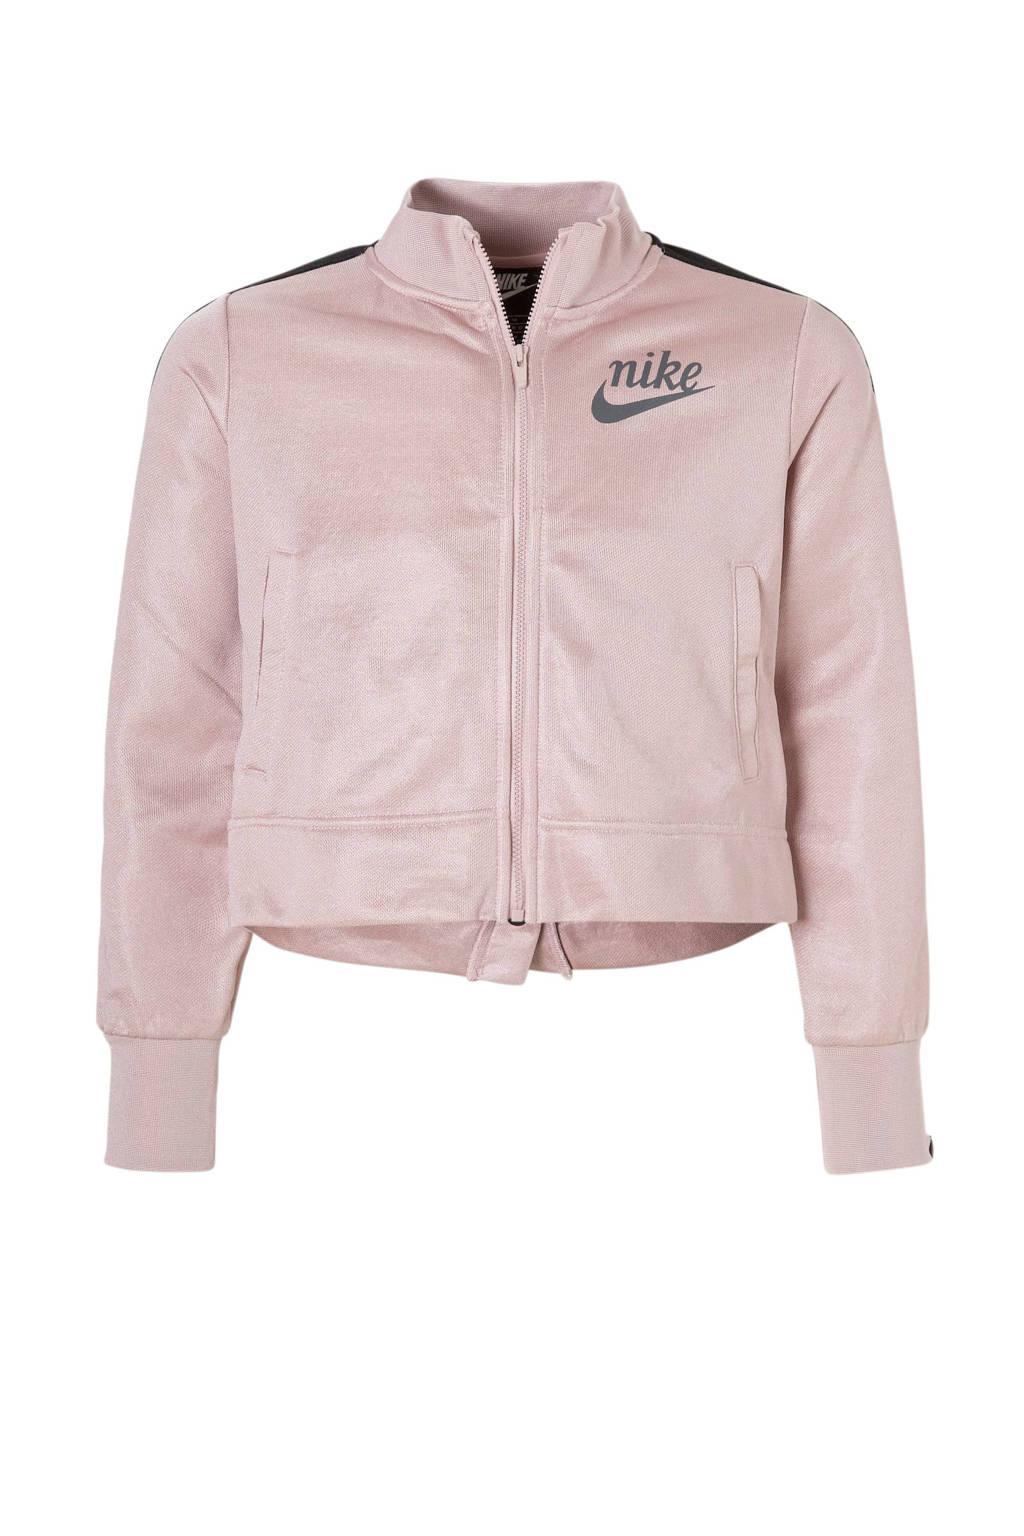 Nike vest roze/zwart, Roze/zwart